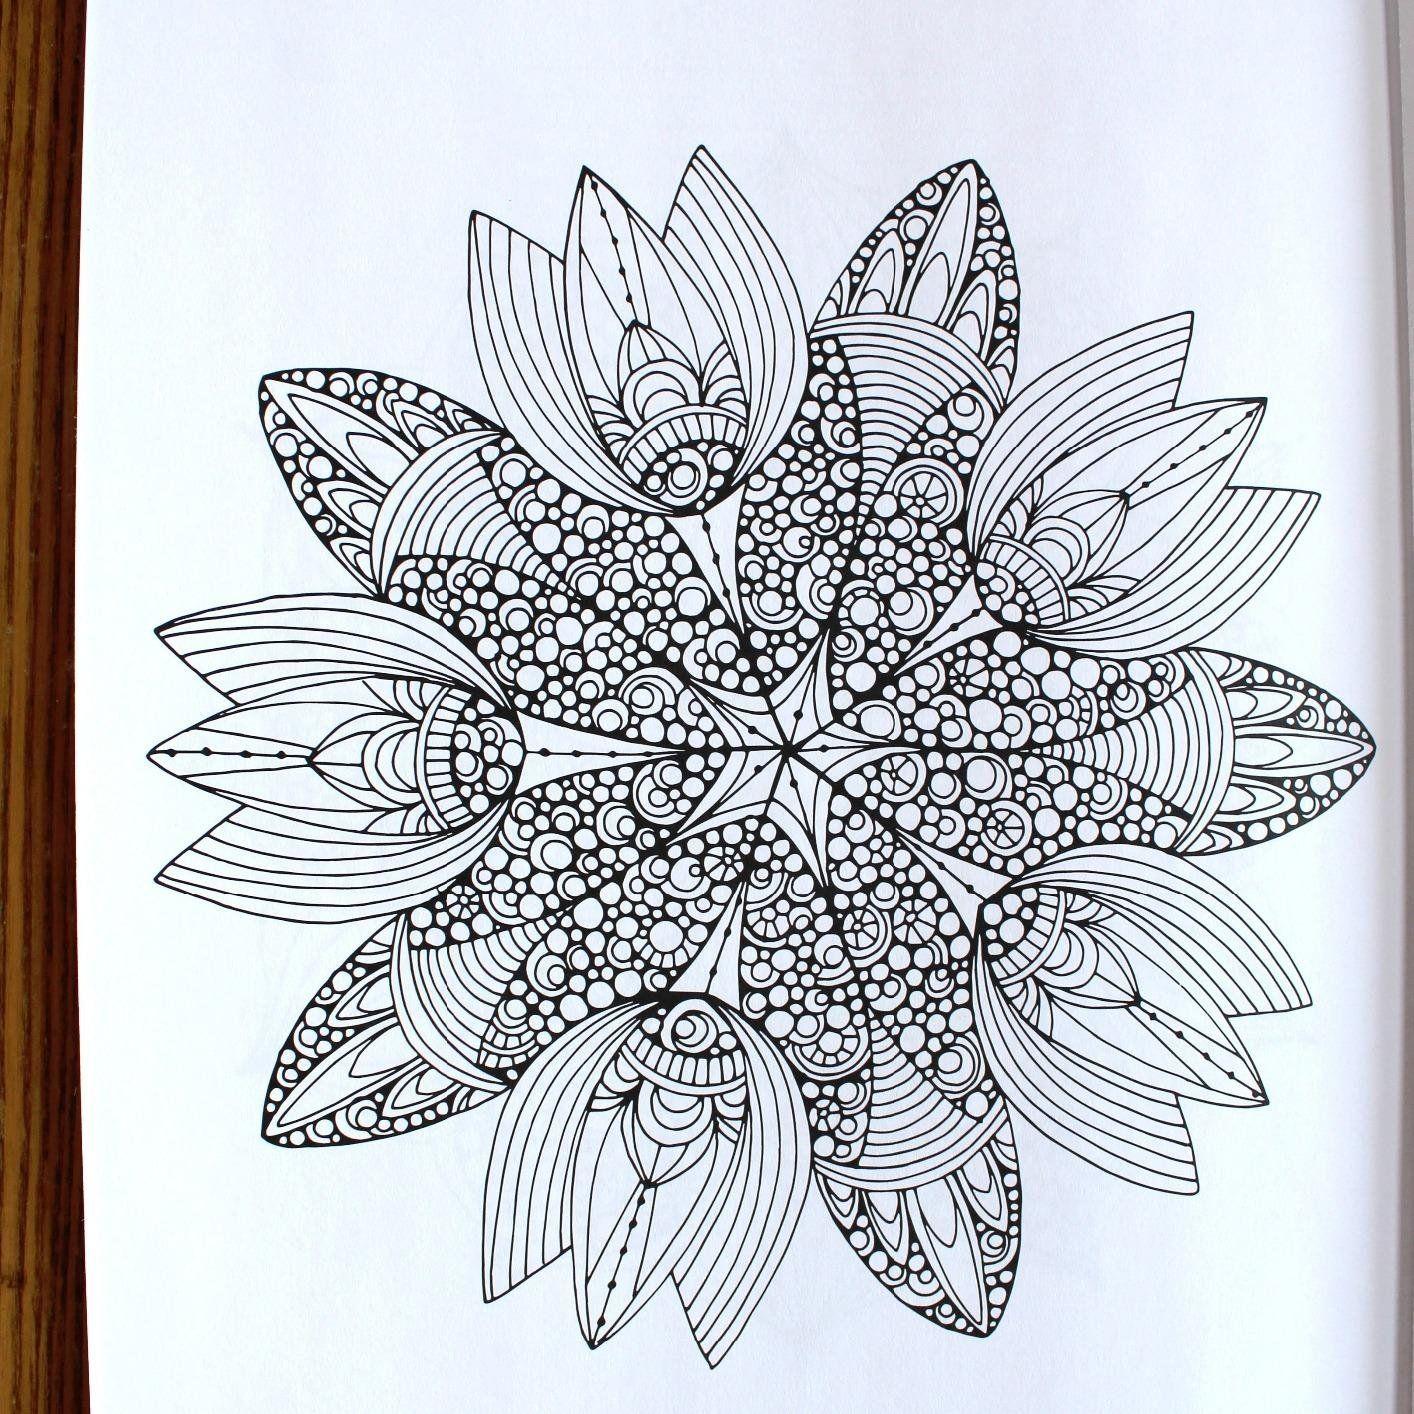 Amazon.com: Creative Coloring Mandalas: Art Activity Pages ...